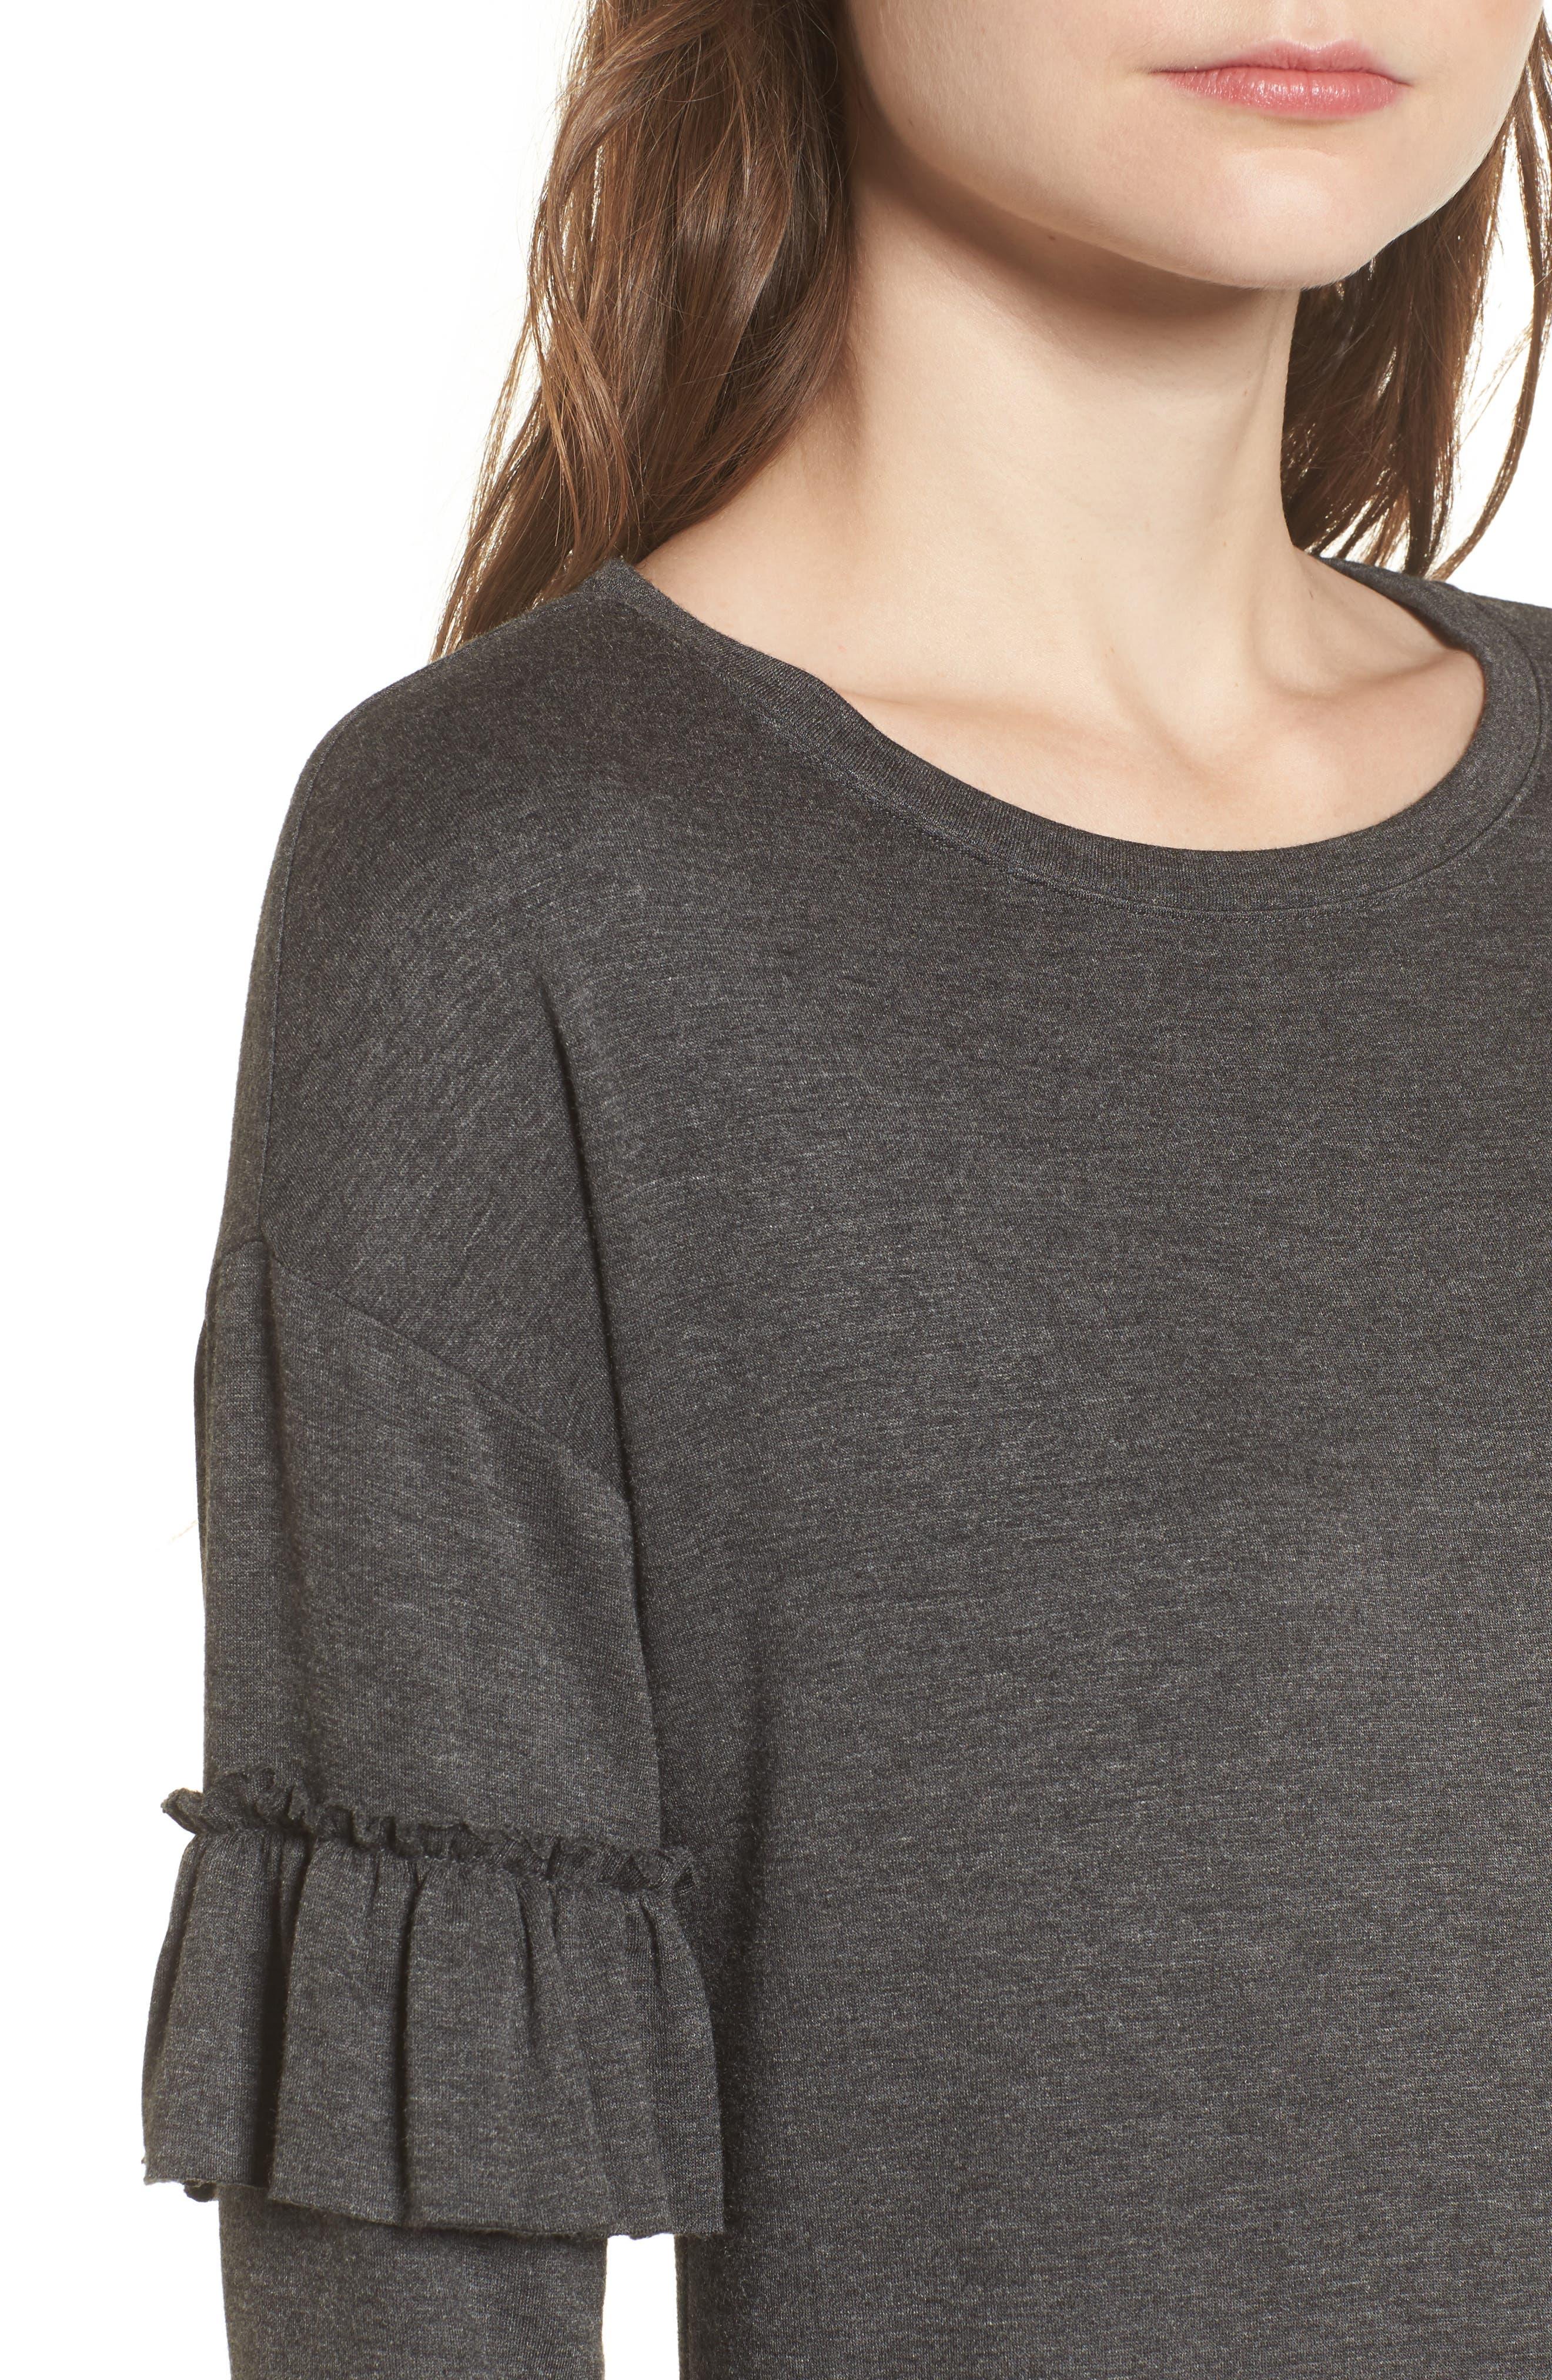 Ruffle Sleeve Sweater Dress,                             Alternate thumbnail 4, color,                             Charcoal